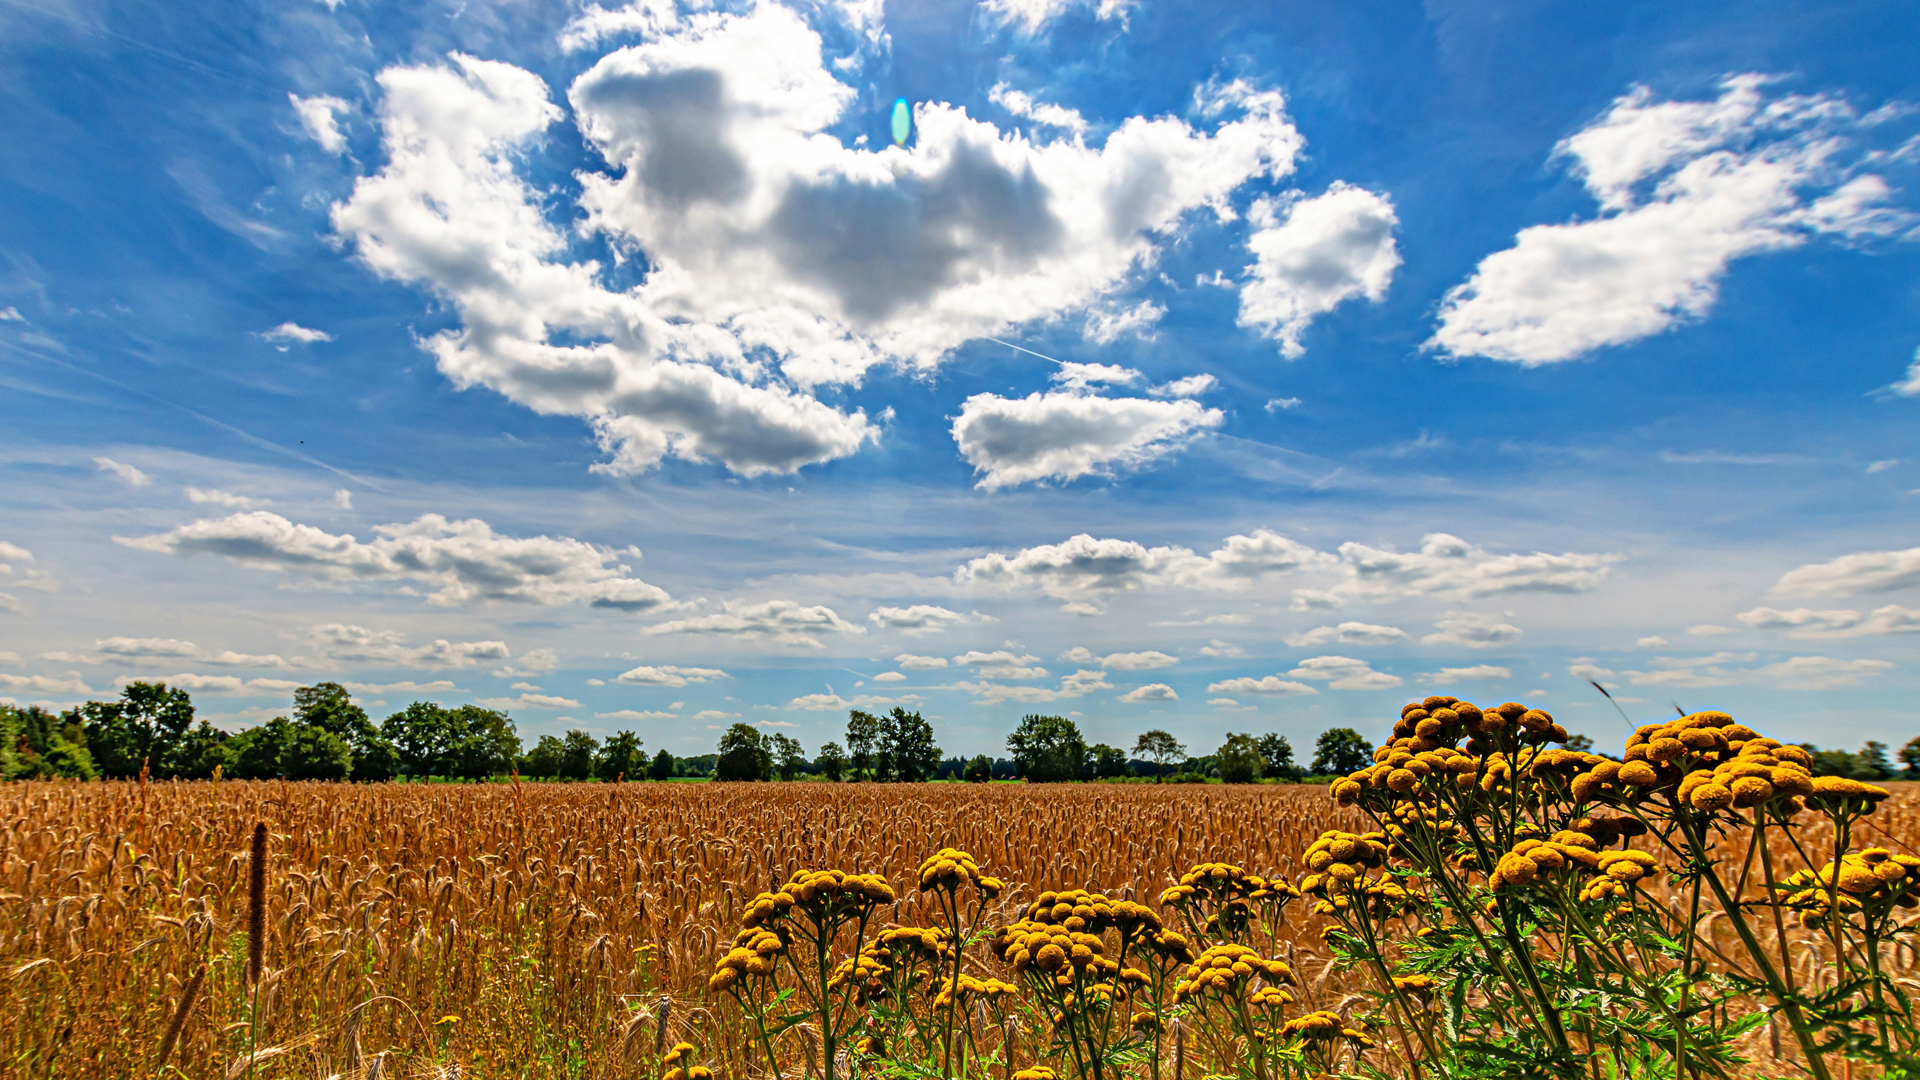 Getreide, Rainfarn, Ruhe - die Landschaft bei Mulmshorn